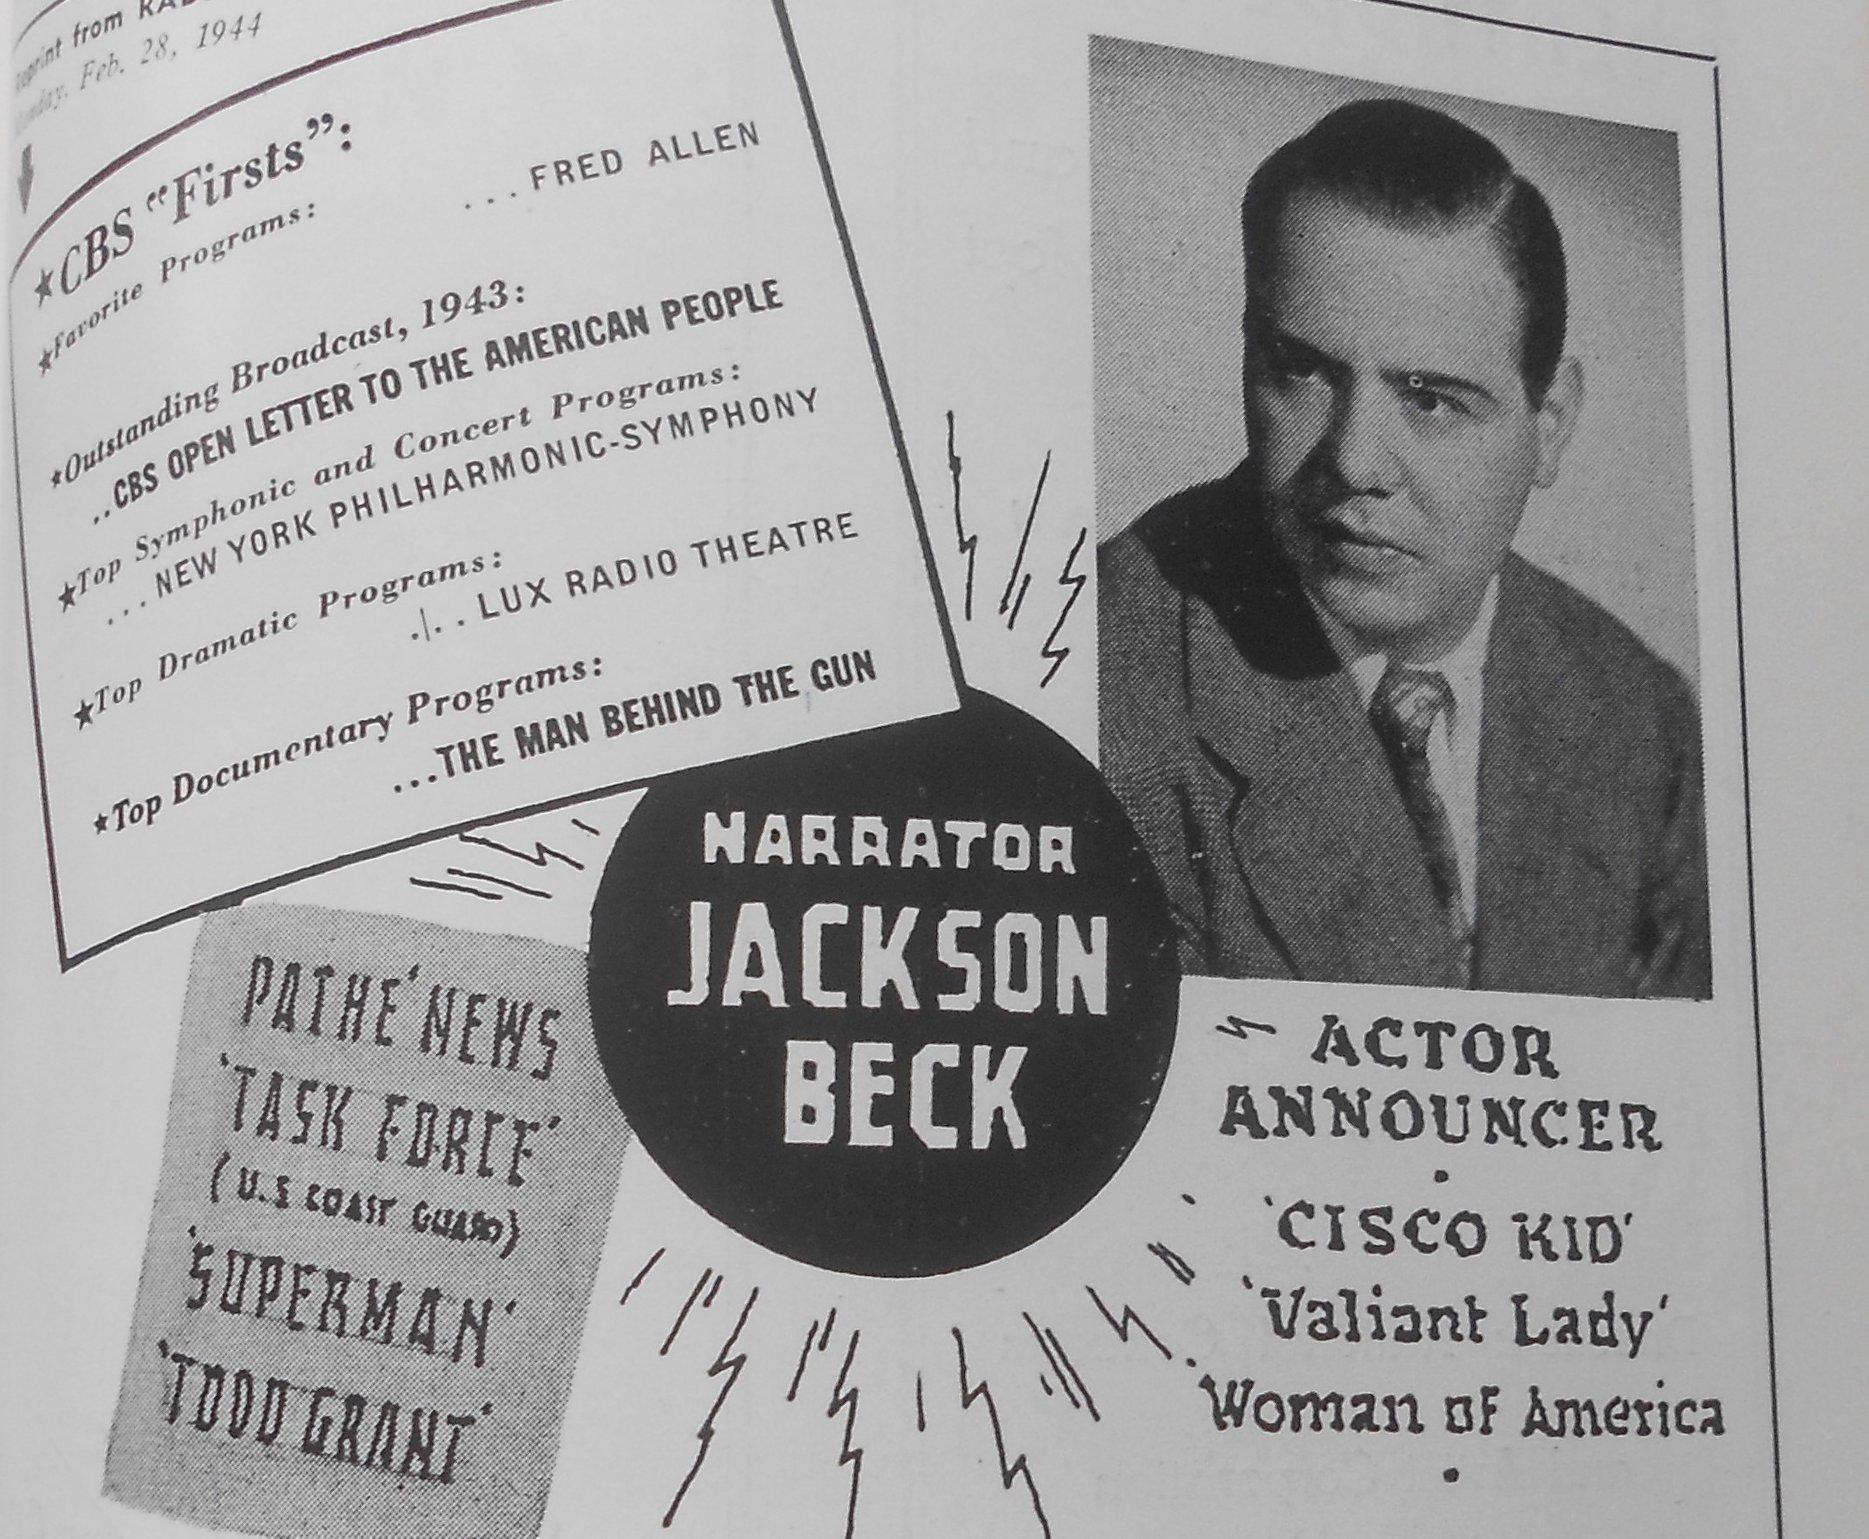 Jackson Beck image